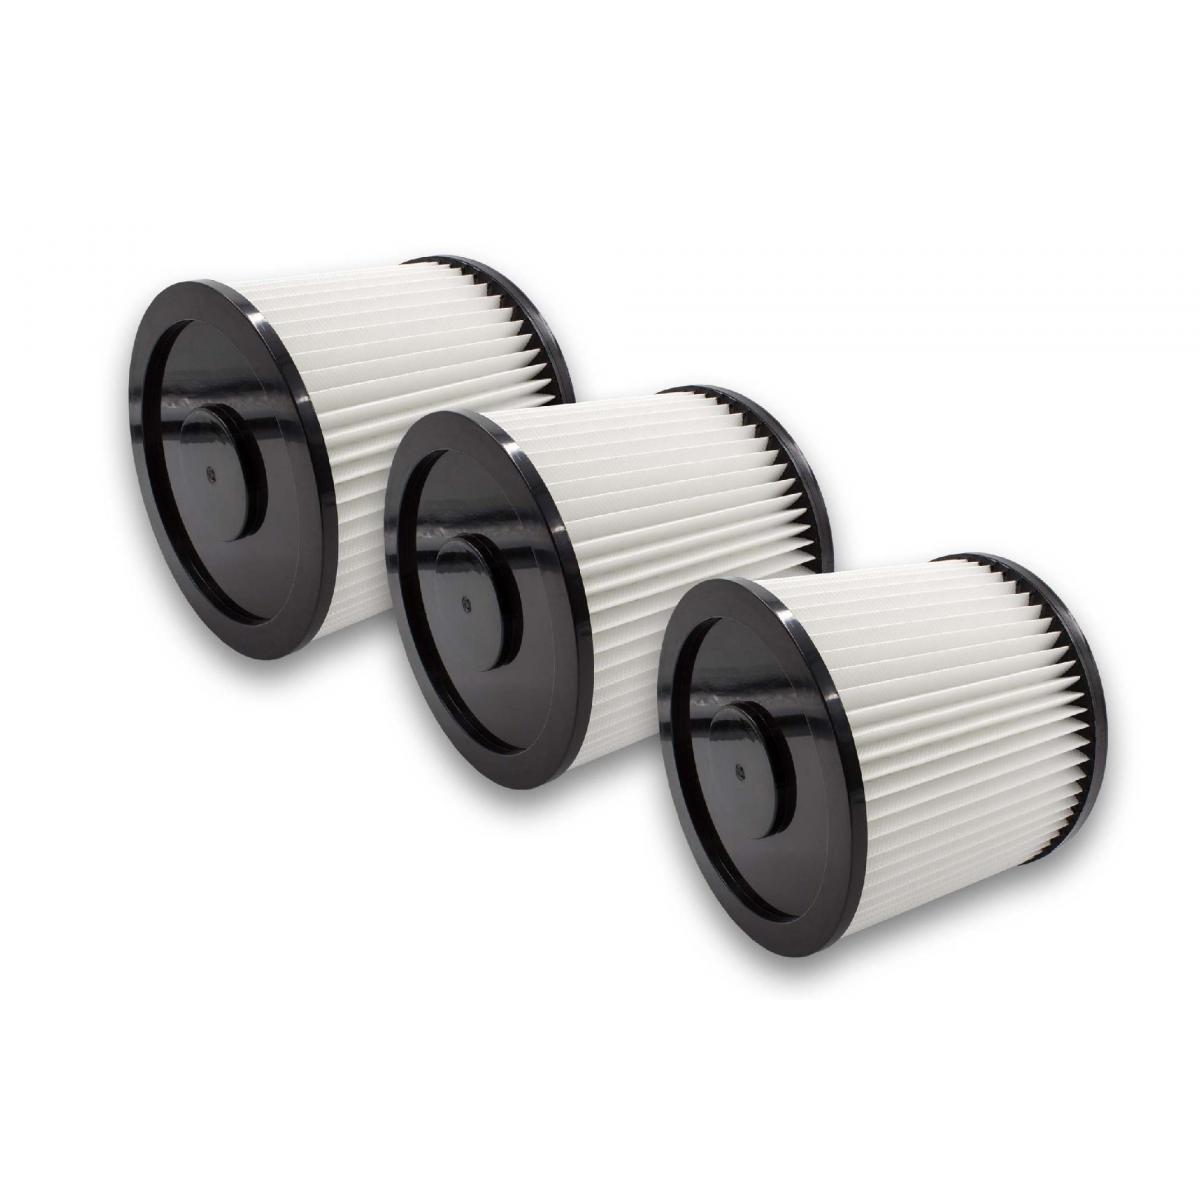 Vhbw vhbw 3x Filtres ronds pour aspirateur multifonctions Shop-Vac Super 615 S2, Super 760, Ultra 40 Blower